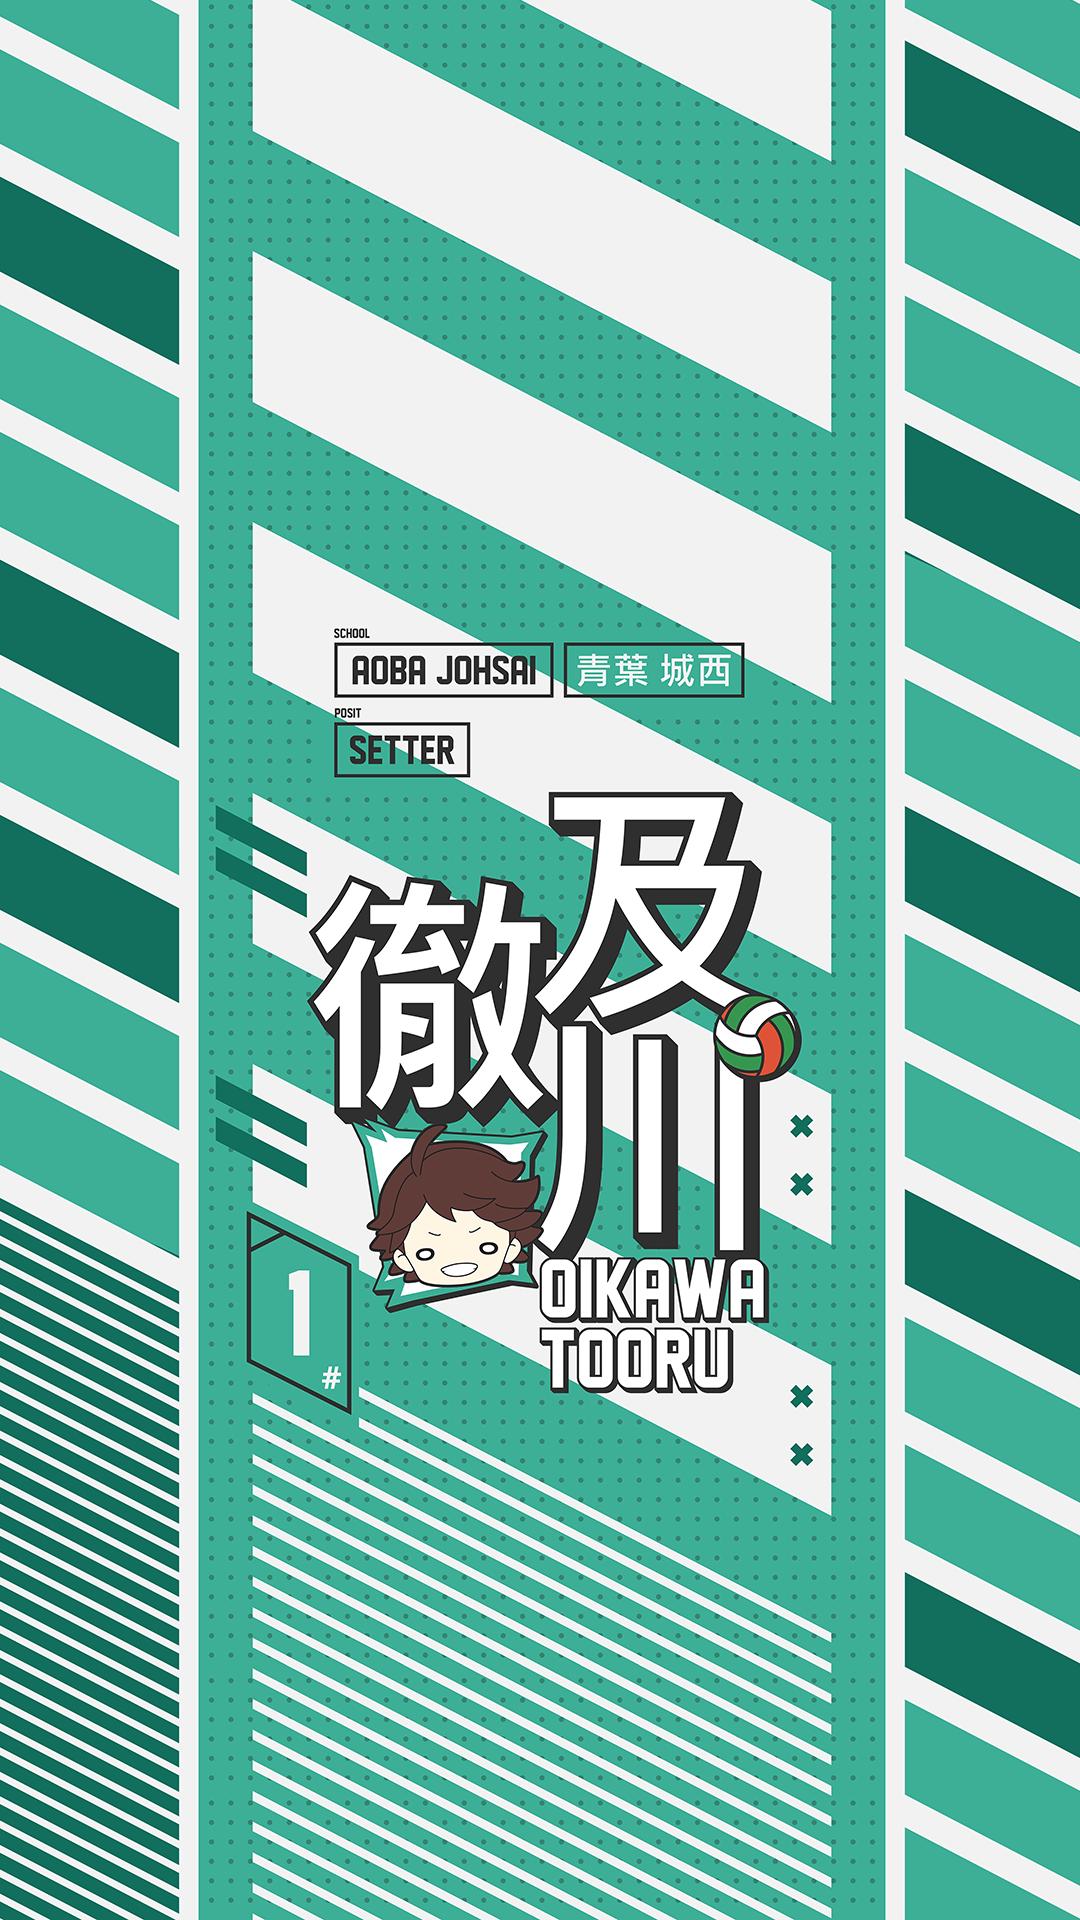 Oikawa Tooru Aoba Johsai Haikyuu Wallpaper In 2020 Haikyuu Wallpaper Anime Wallpaper Haikyuu Anime